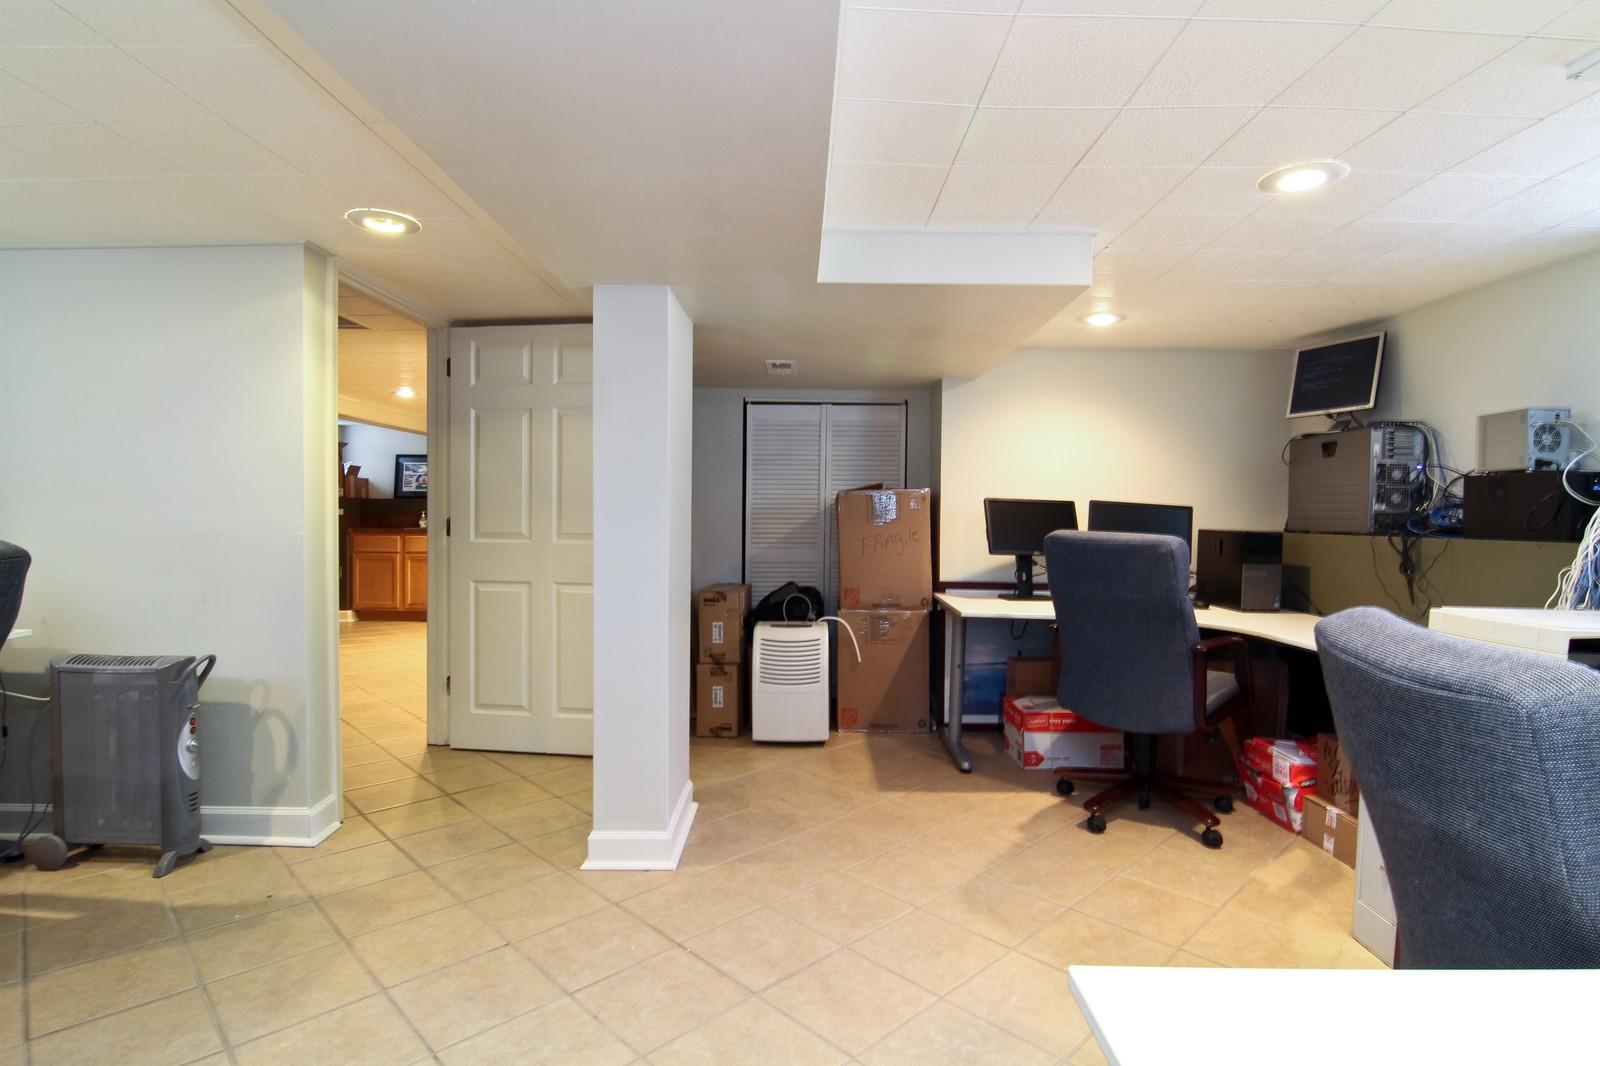 Real Estate Photography - 310 S Hale St, Wheaton, IL, 60187 - Location 2